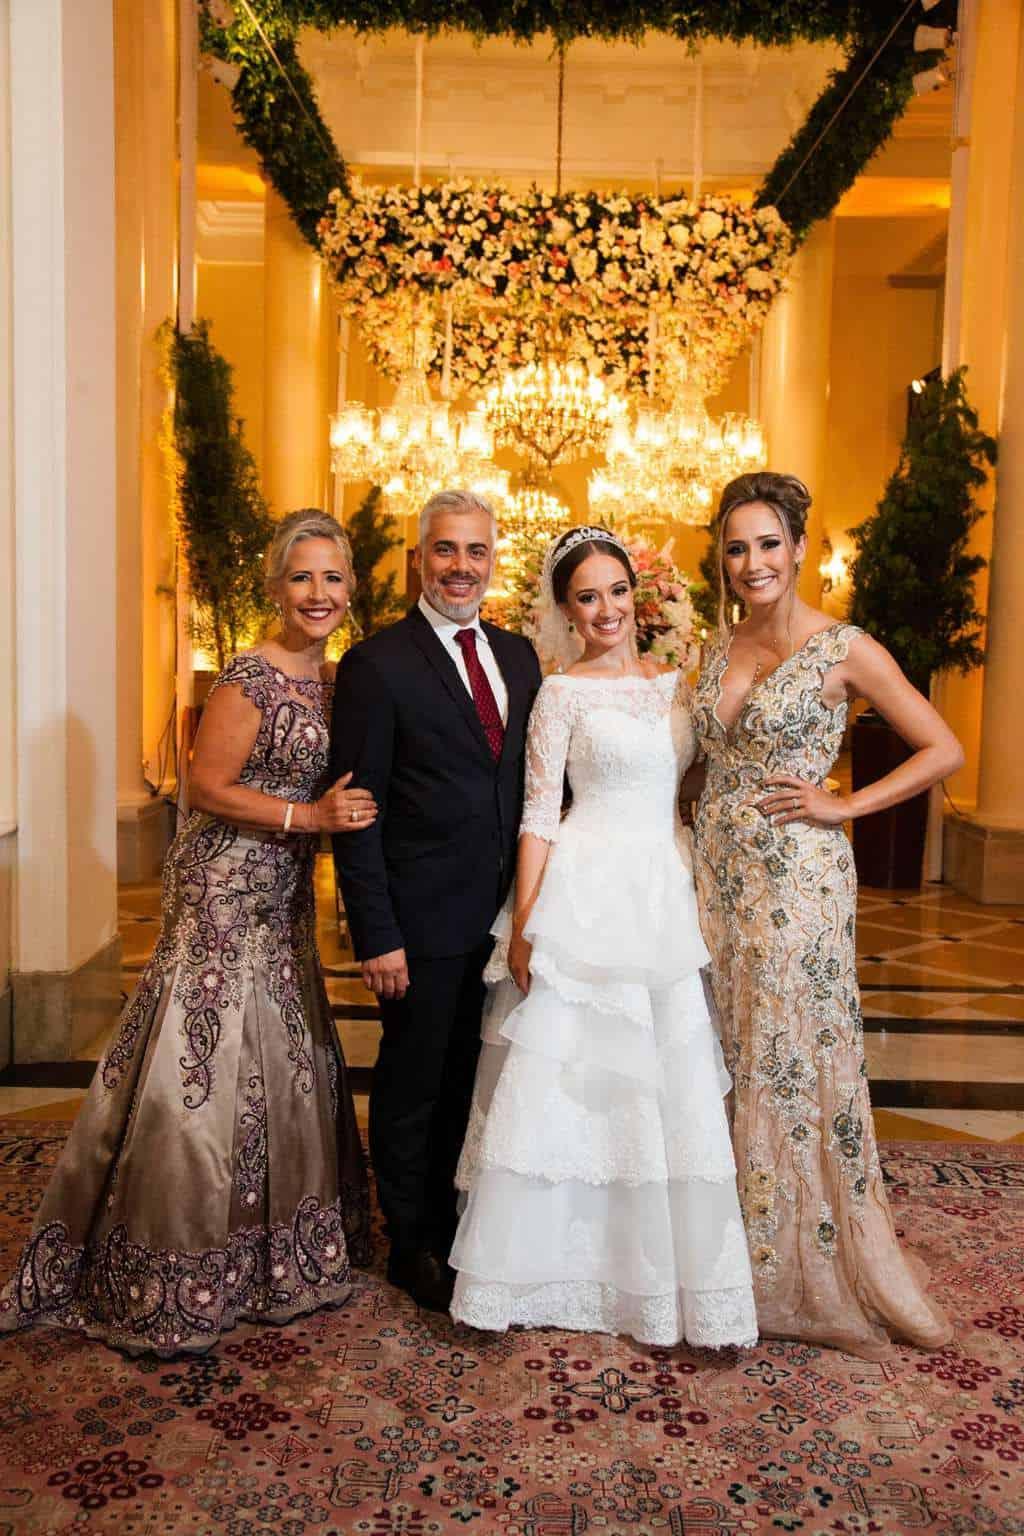 Casamento-Clássico-Casamento-tradicional-Copacabana-Palace-Monica-Roias-Ribas-Foto-e-Vídeo-Tuanny-e-Bernardo-CaseMe-3